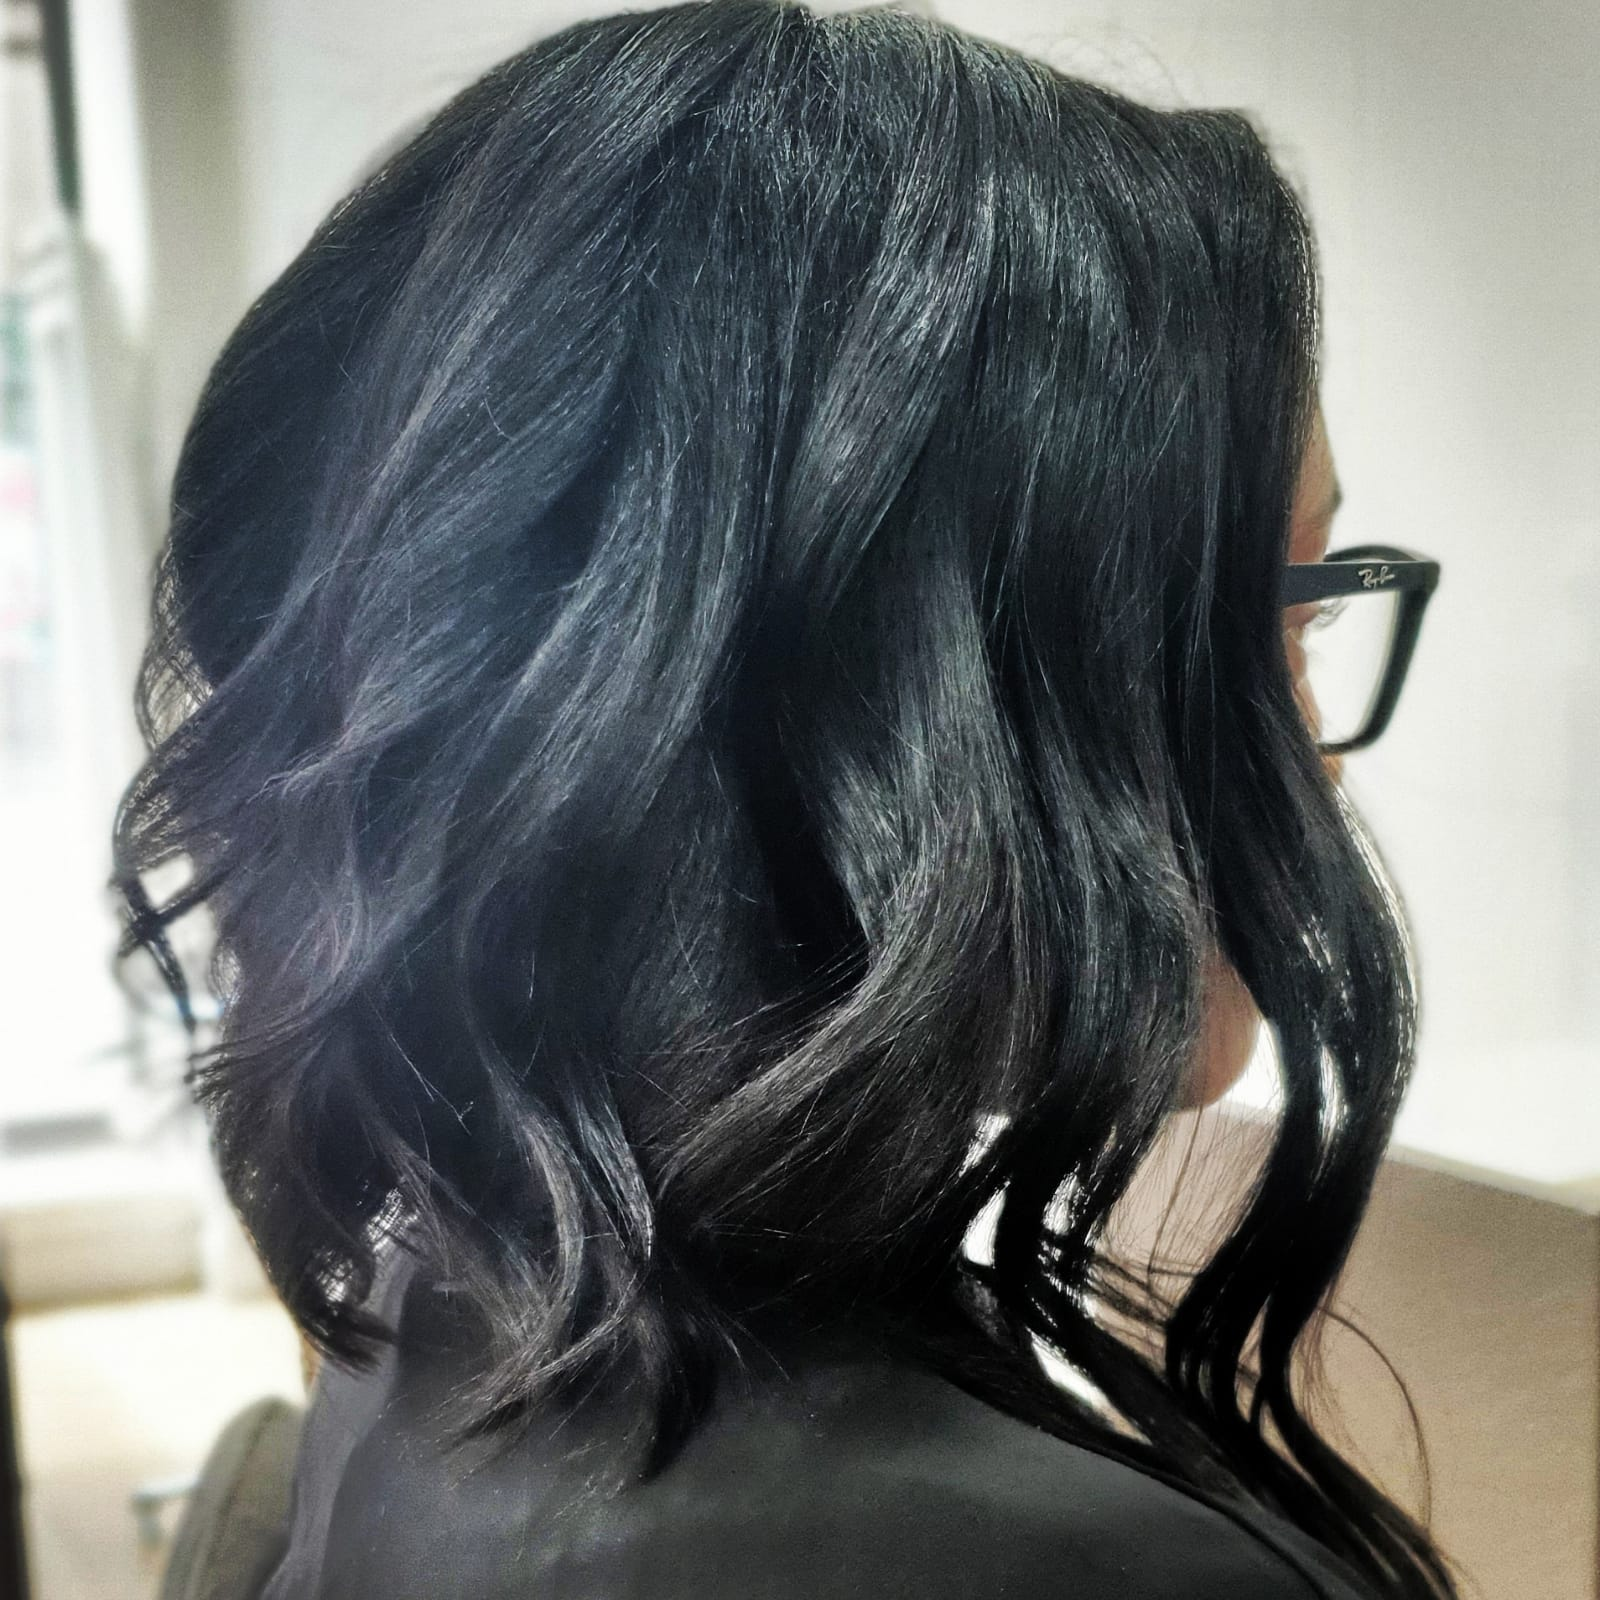 salon de coiffure afro tresse tresses box braids crochet braids vanilles tissages paris 75 77 78 91 92 93 94 95 CJWJAJXJ